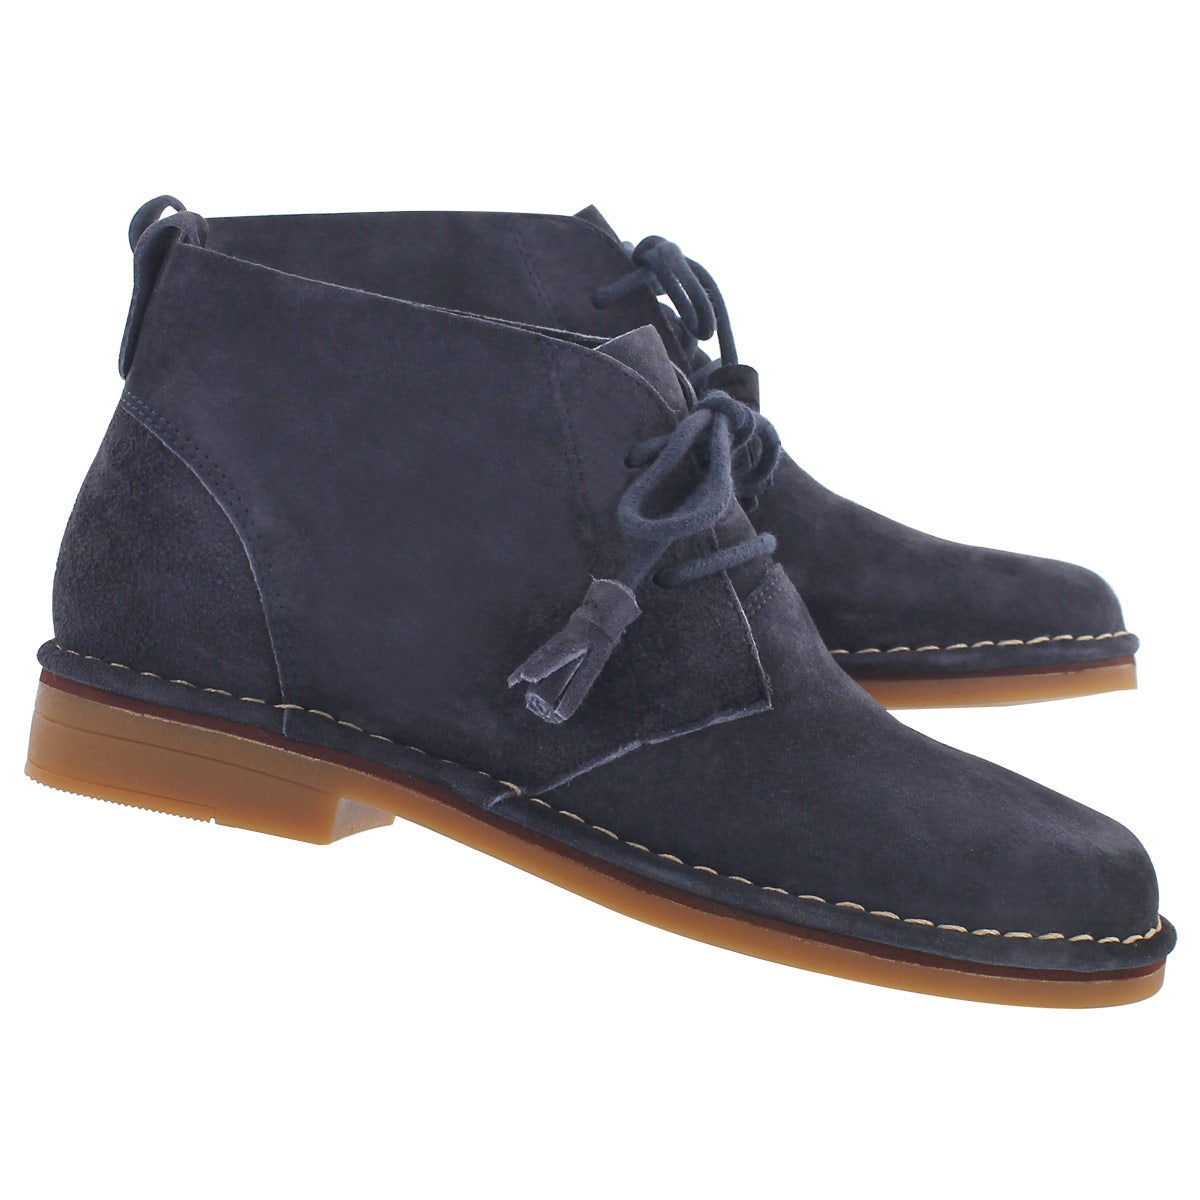 Lds Cyra Catelyn navy chukka boot